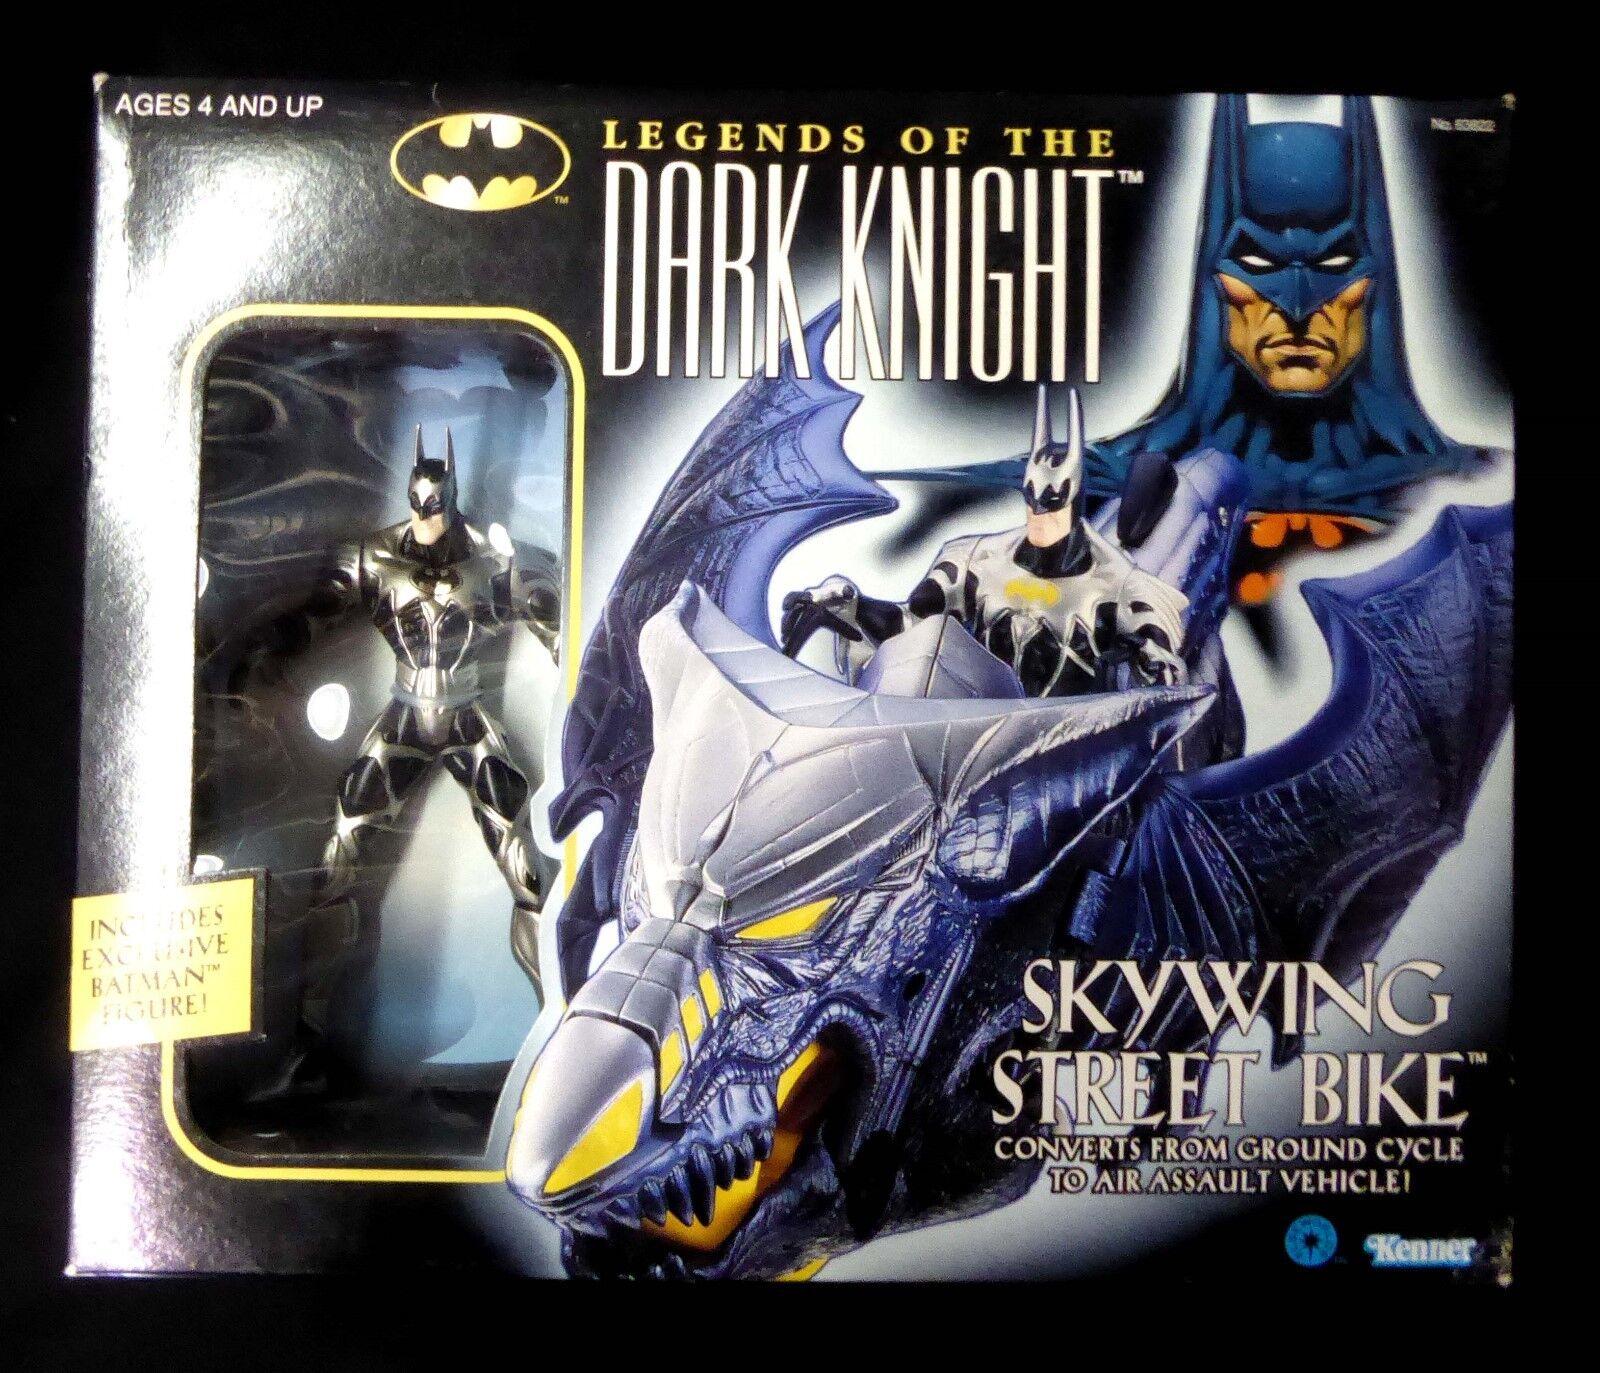 Dark knight skywing street bike & action - figur batman dc comics neue 1996